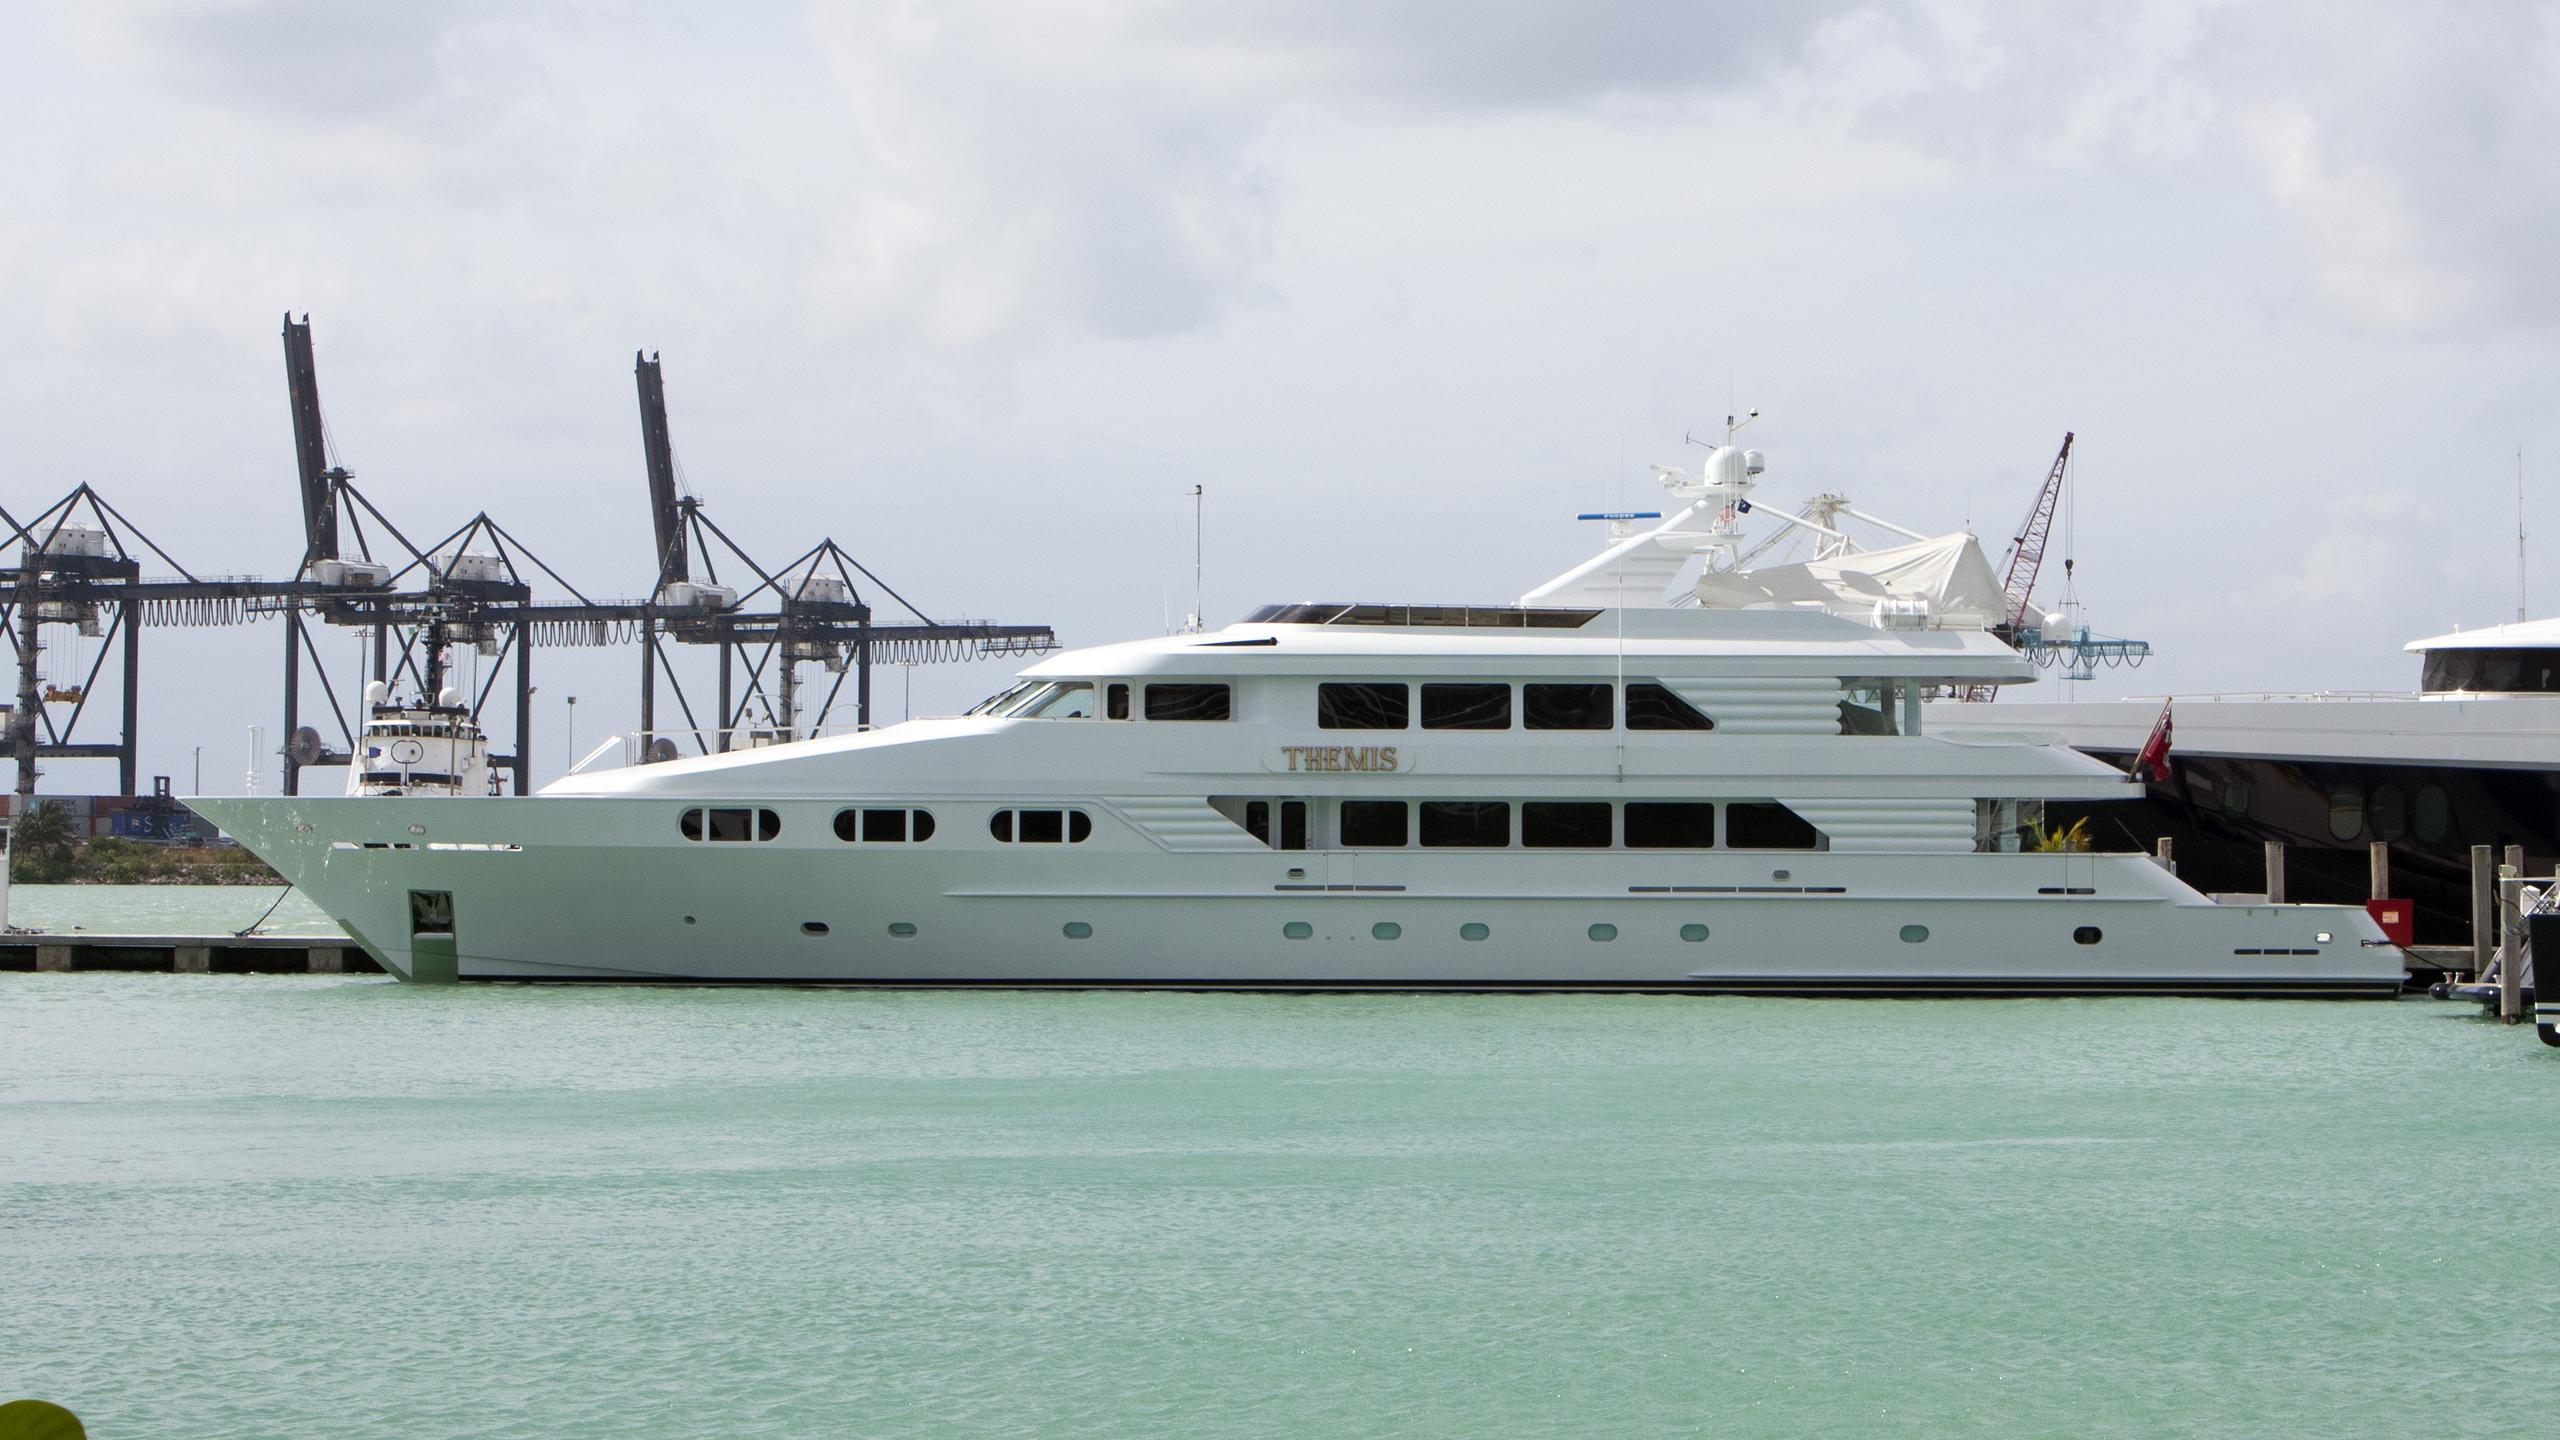 themis-motoryacht-trinity-yachts-1998-48m-profile